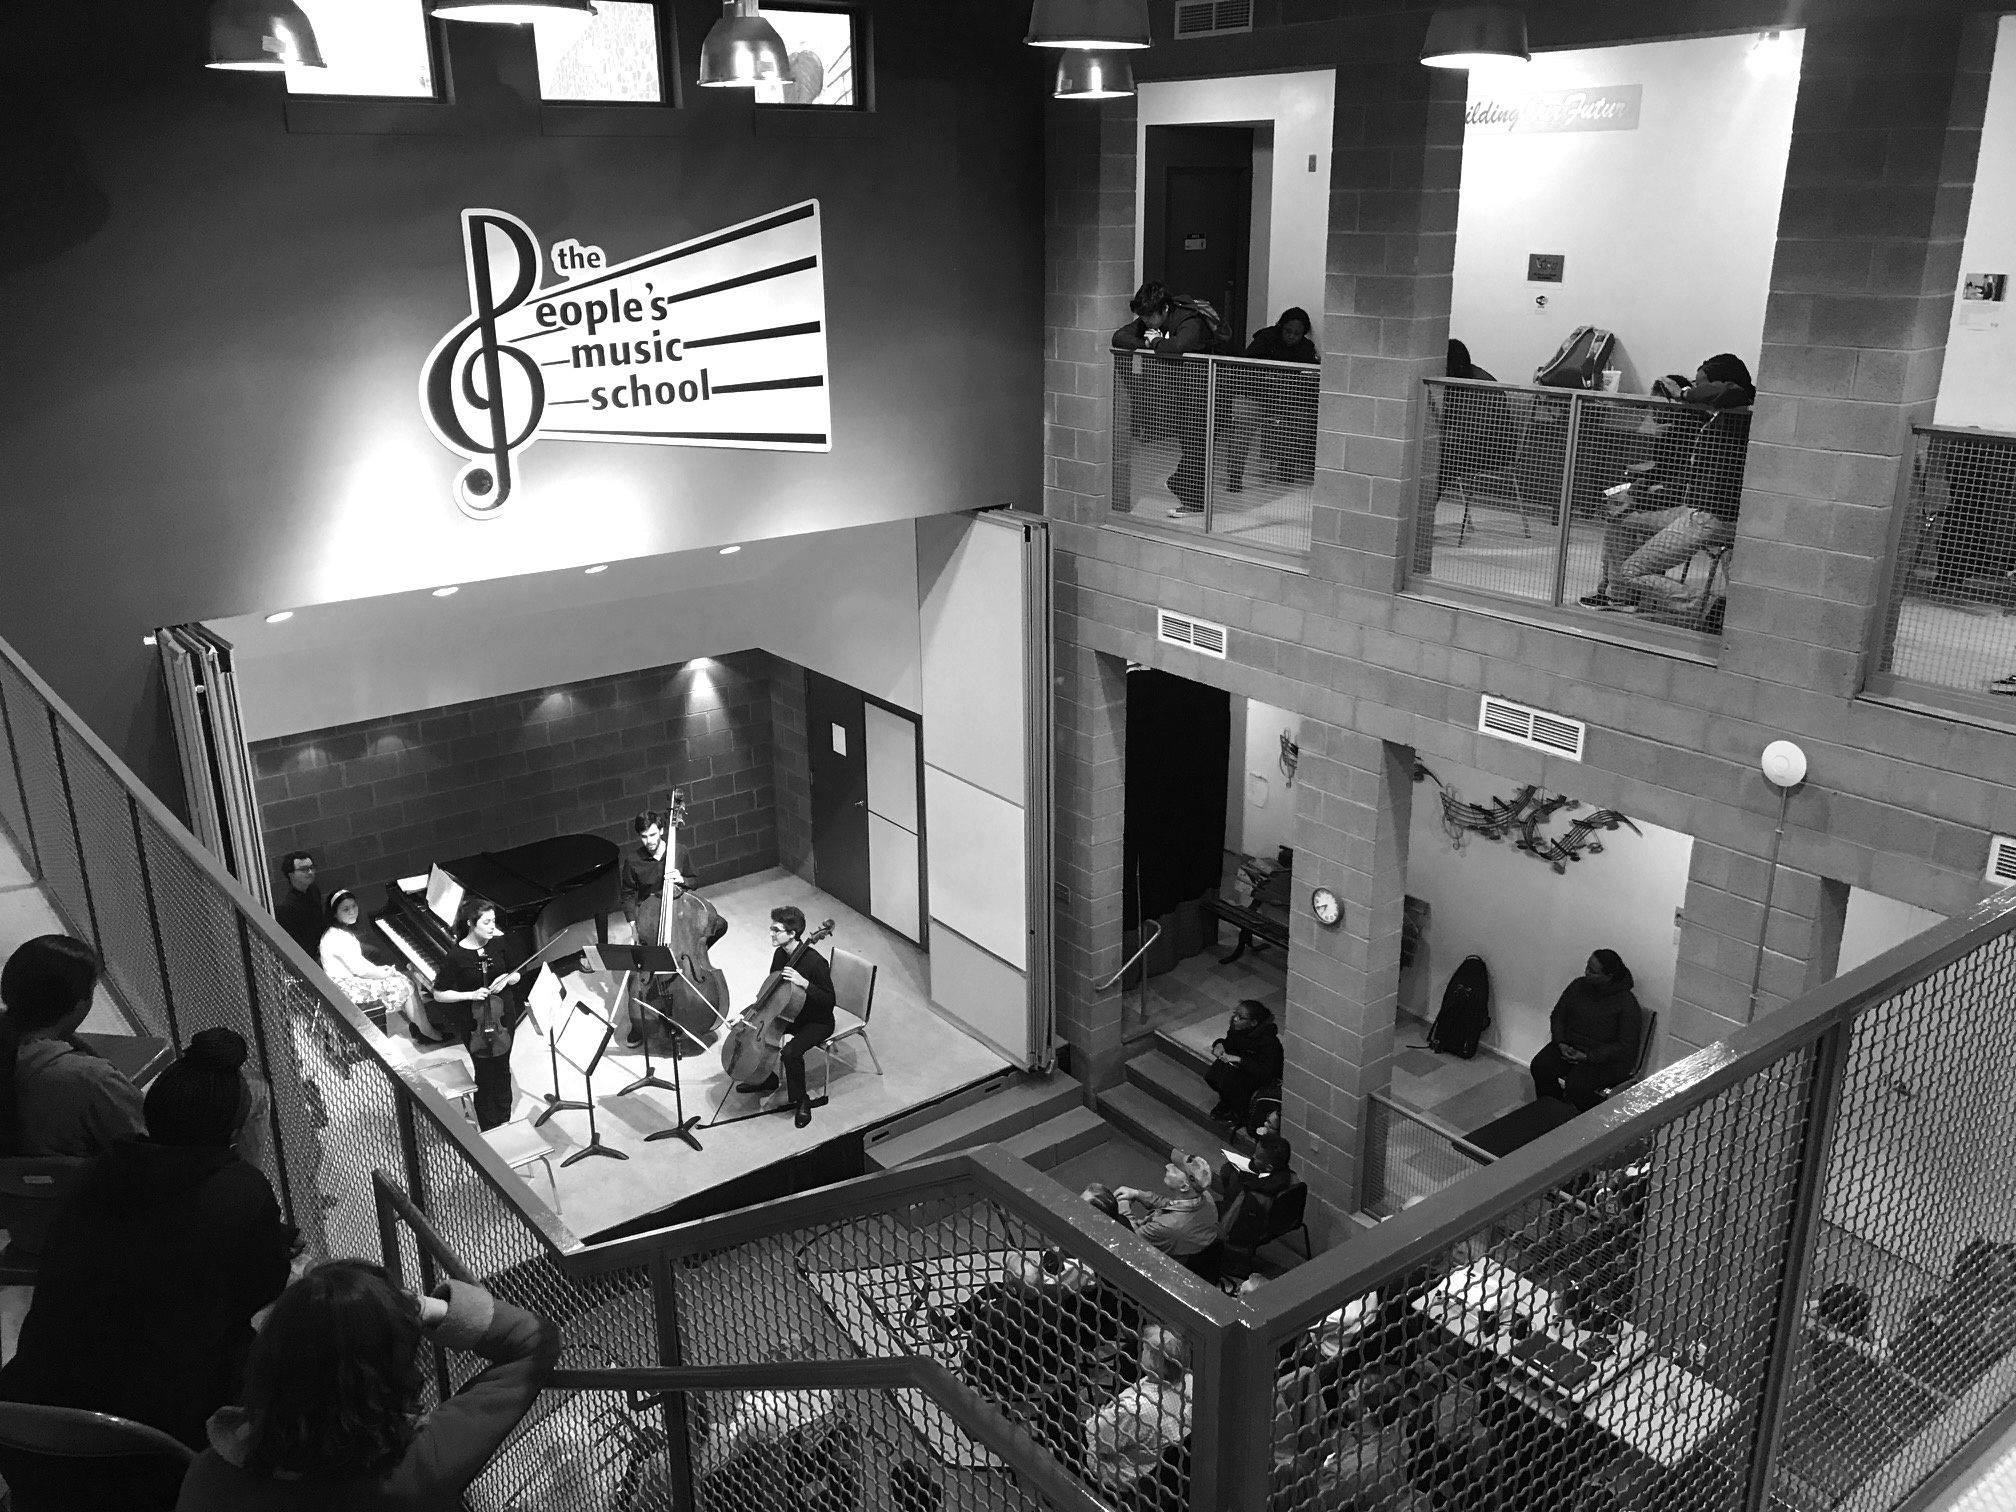 The People's Music School